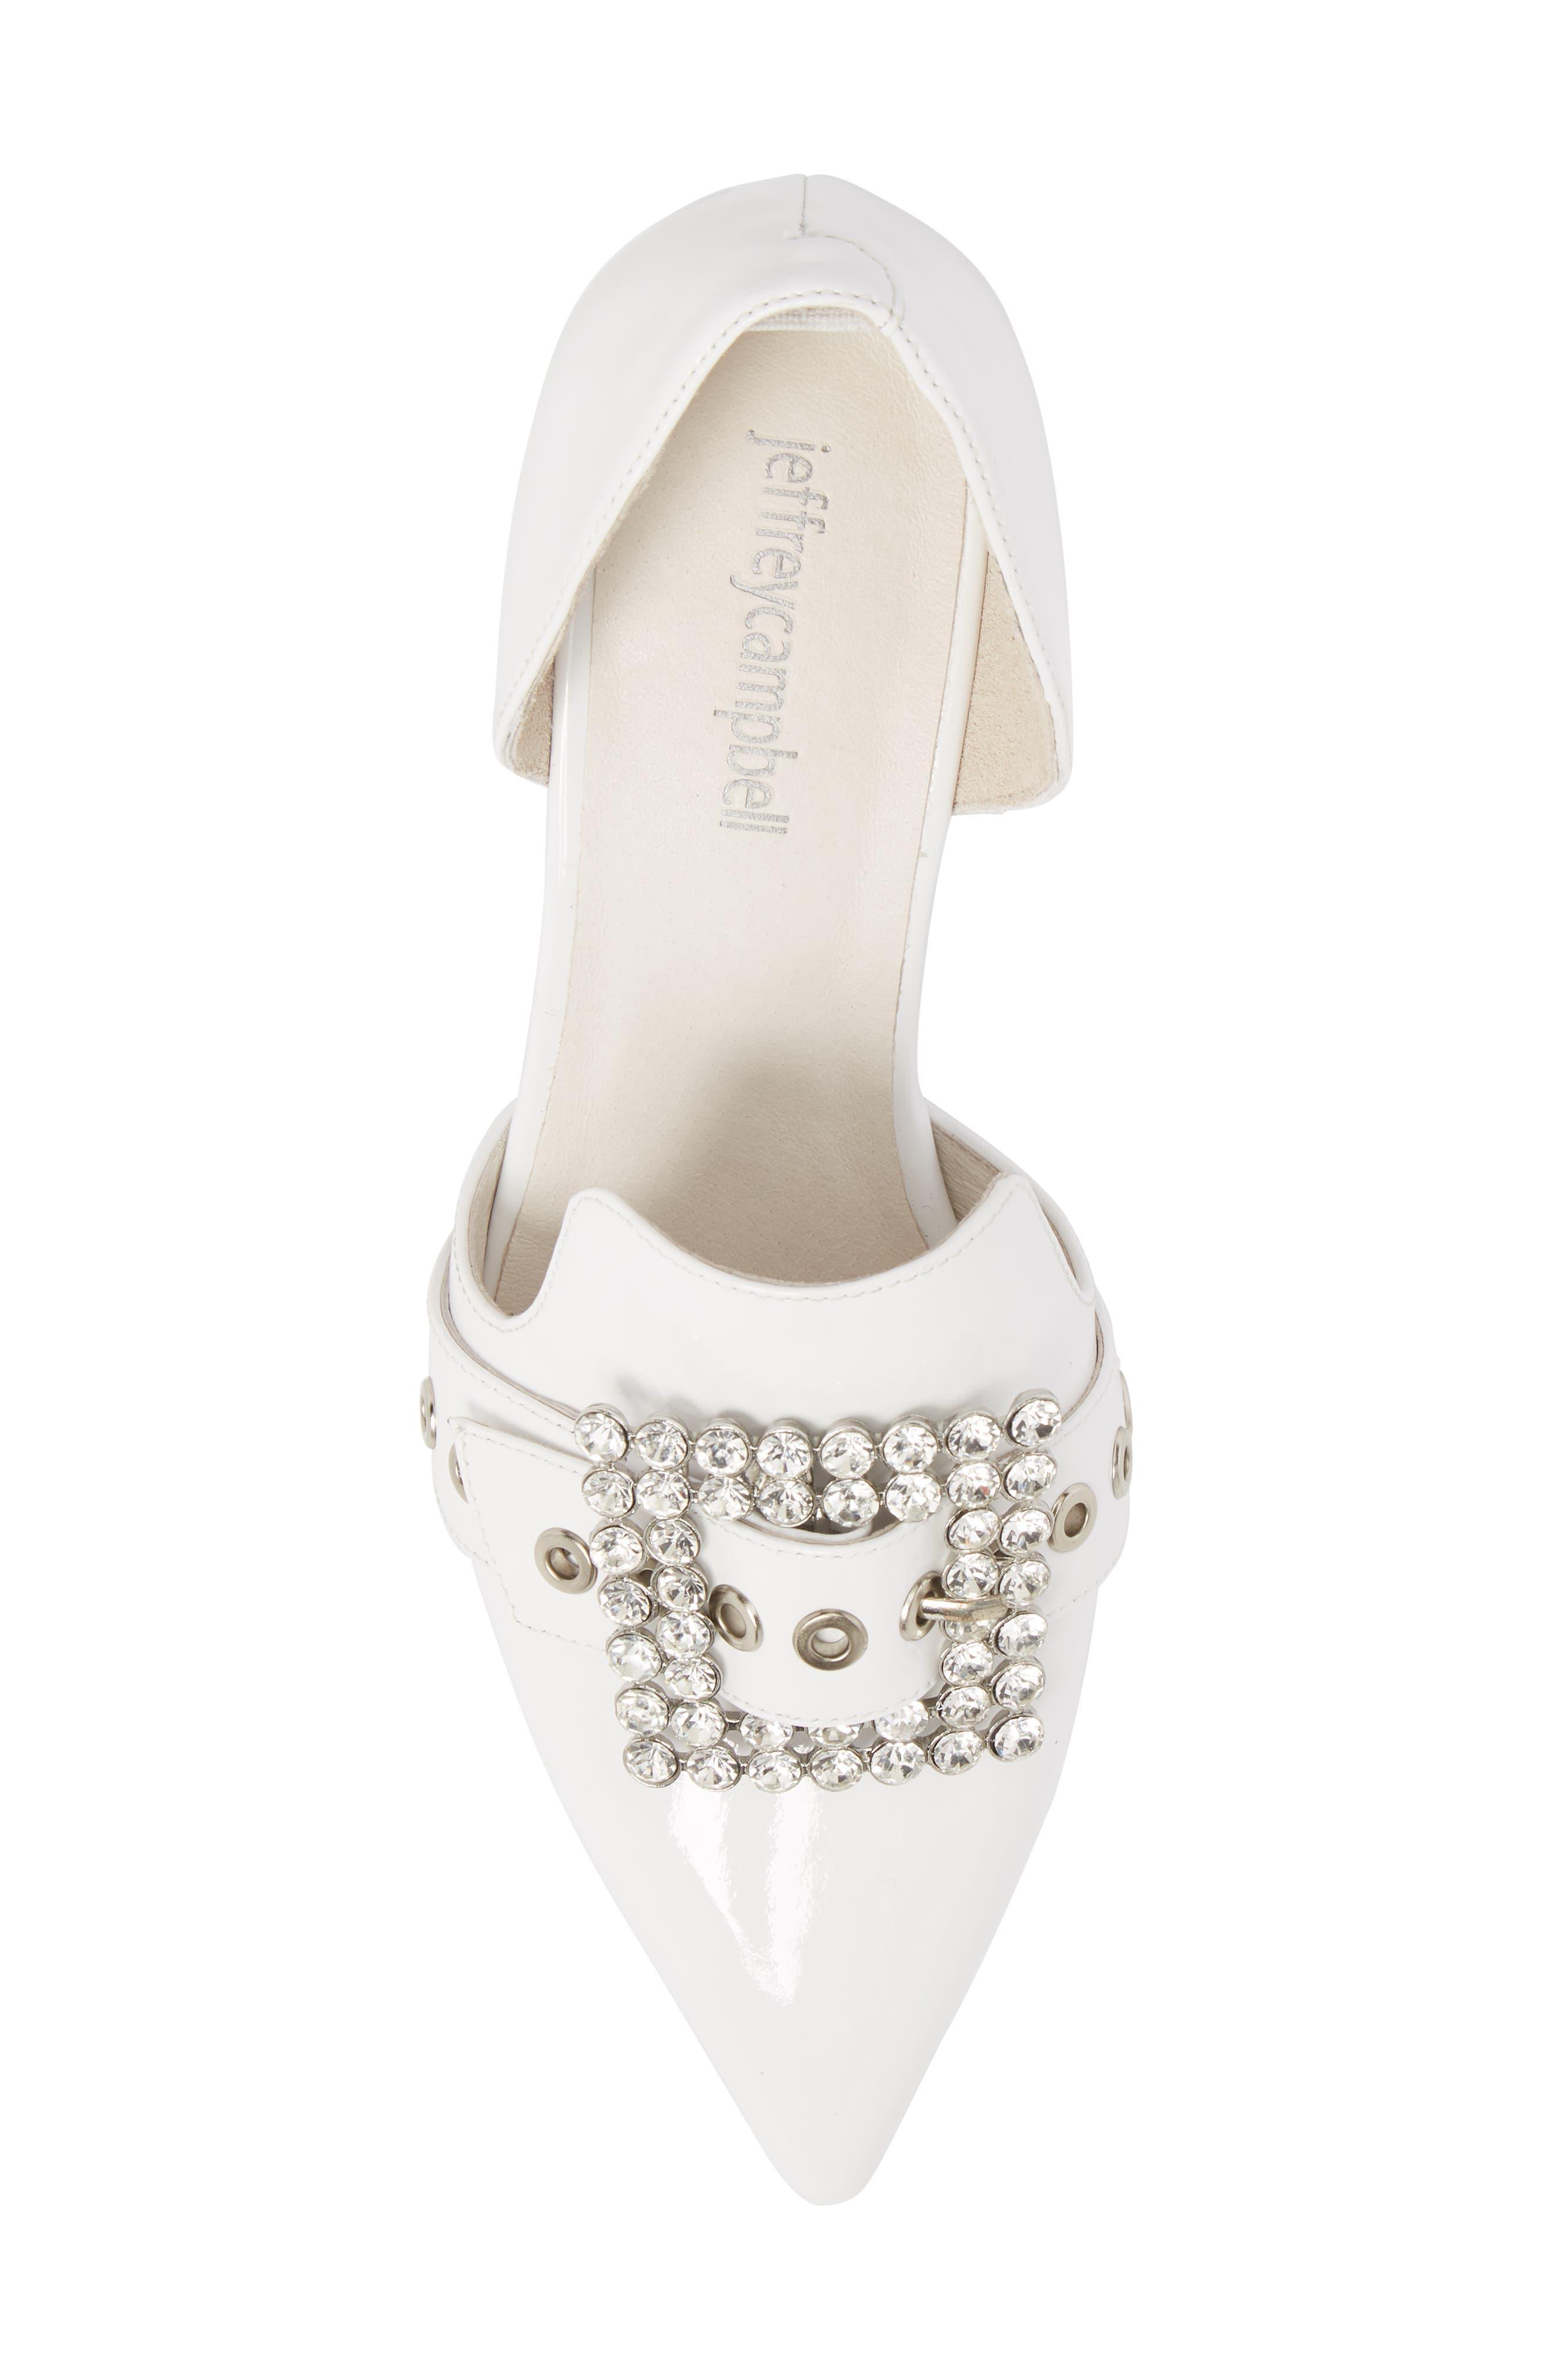 Zofia Jeweled Heel Pump,                             Alternate thumbnail 5, color,                             White Patent Silver